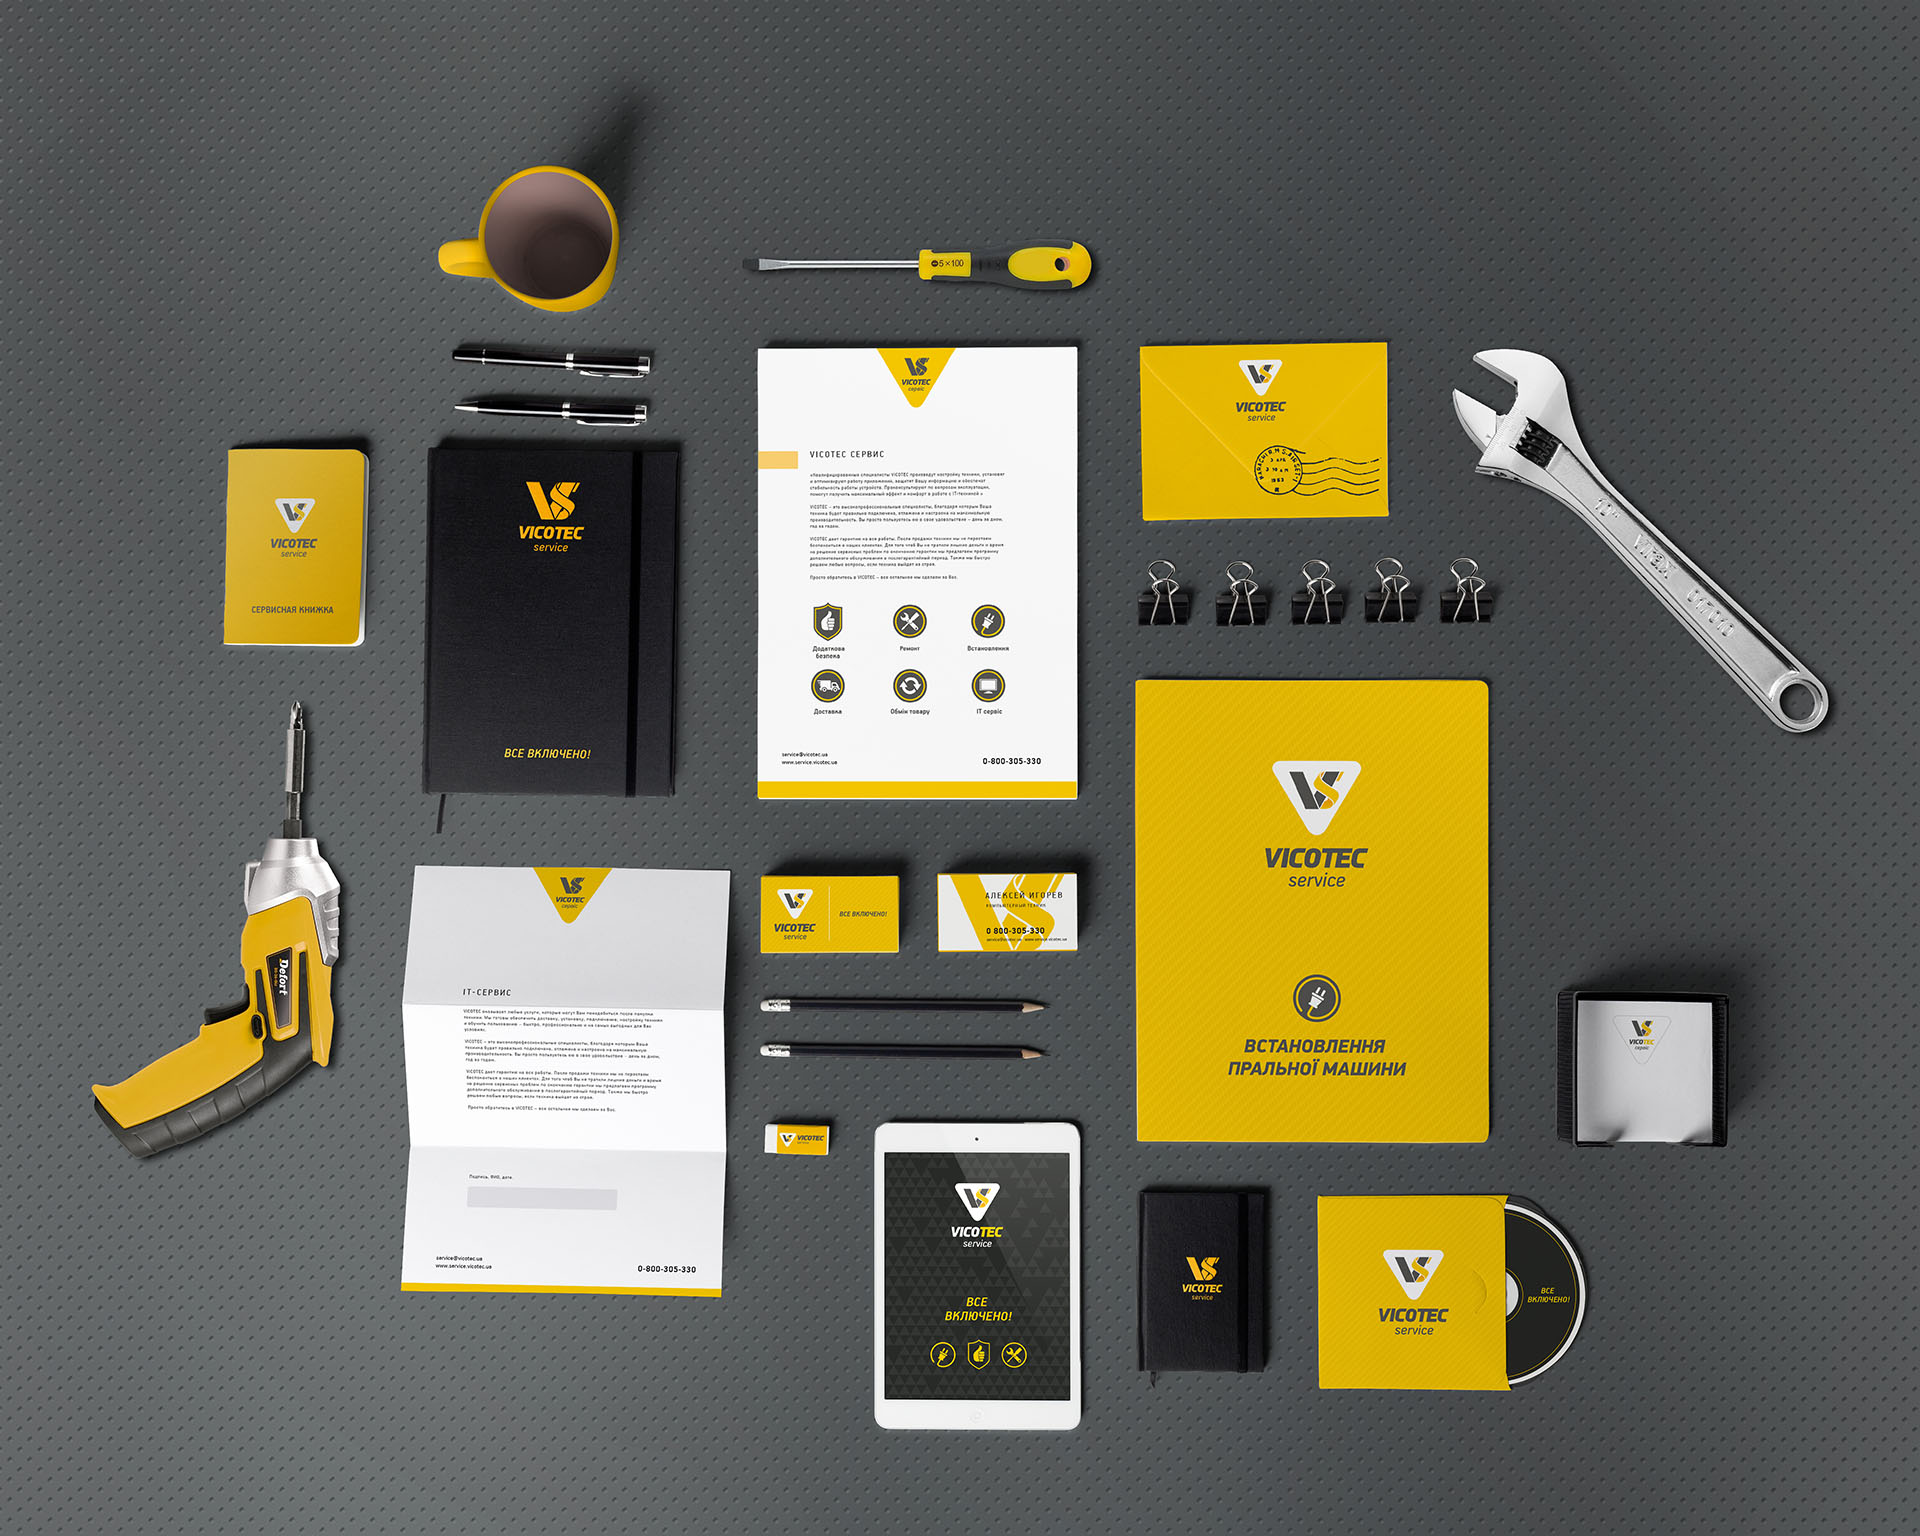 brand book Vicotec сервис, Brandbook Vicotec service